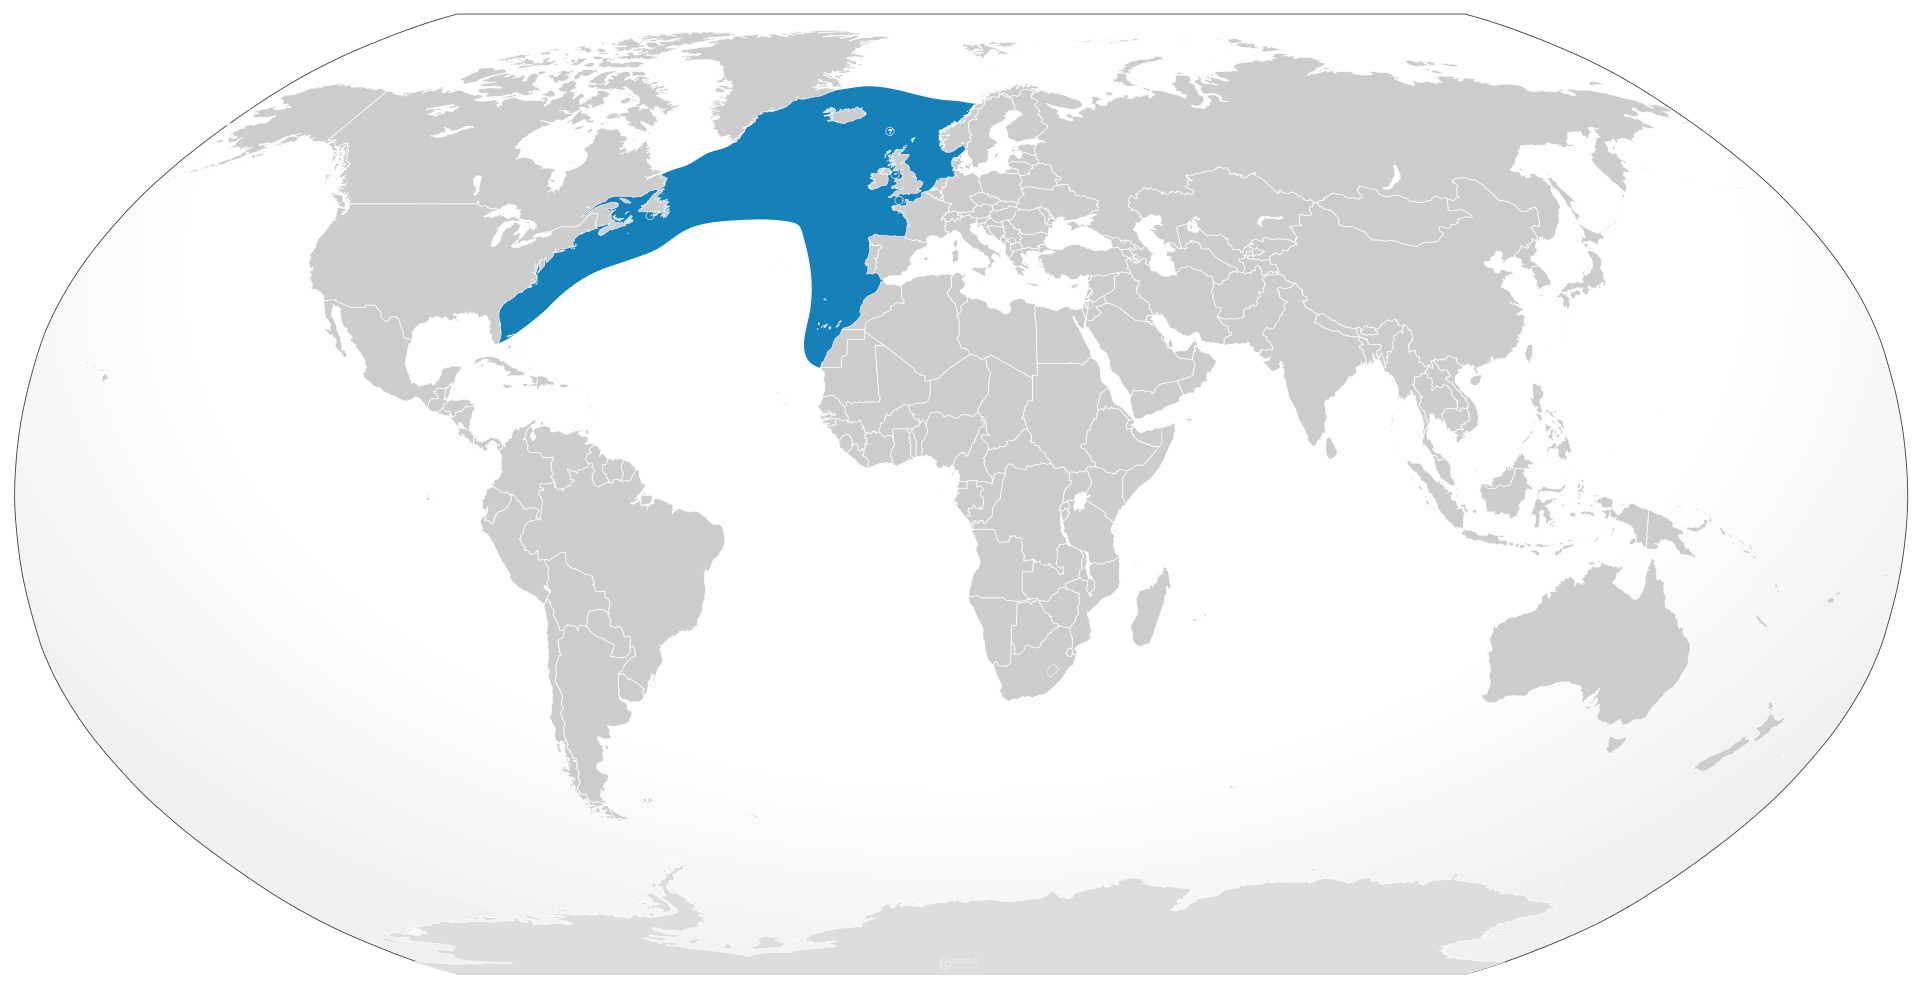 Distrubution map